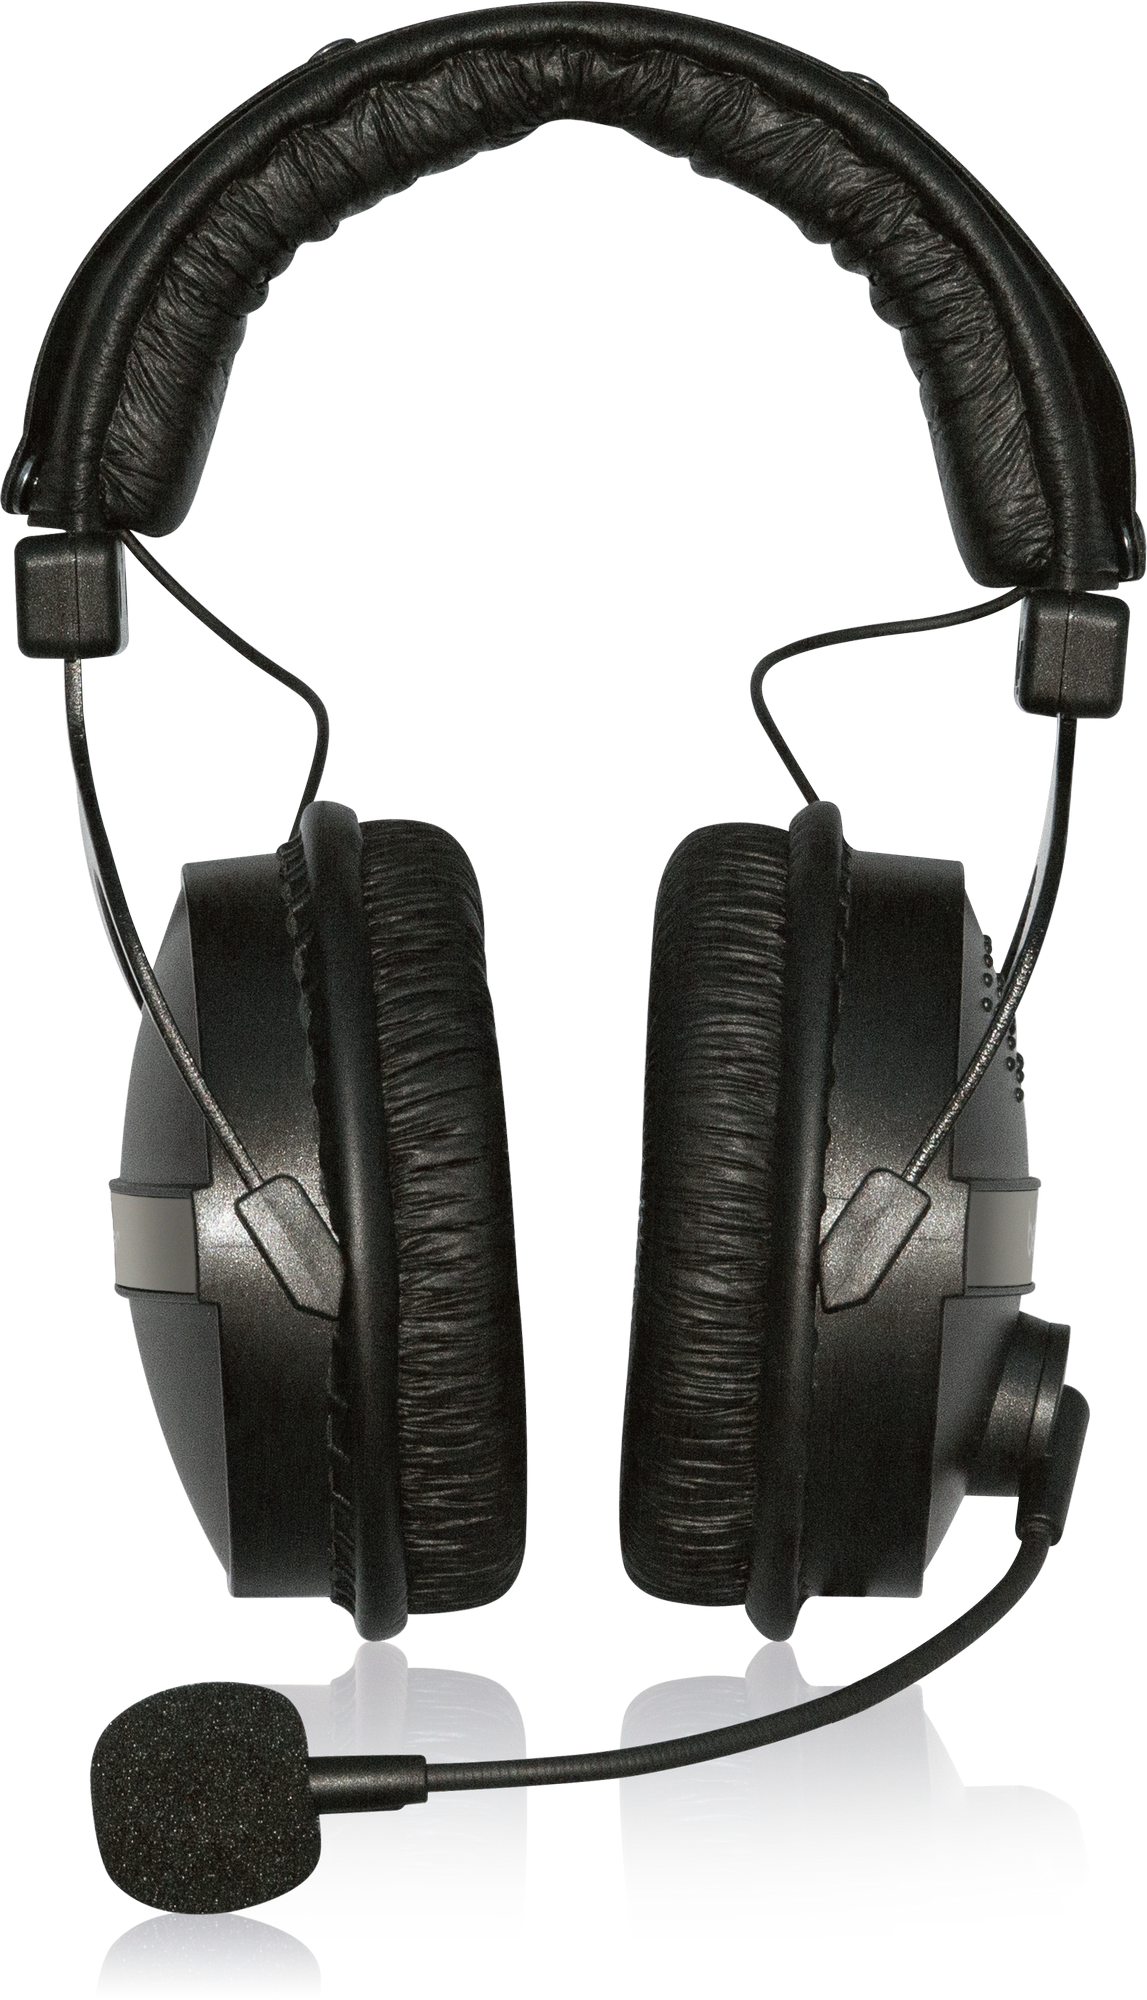 Behringer HLC 660M - Headphone